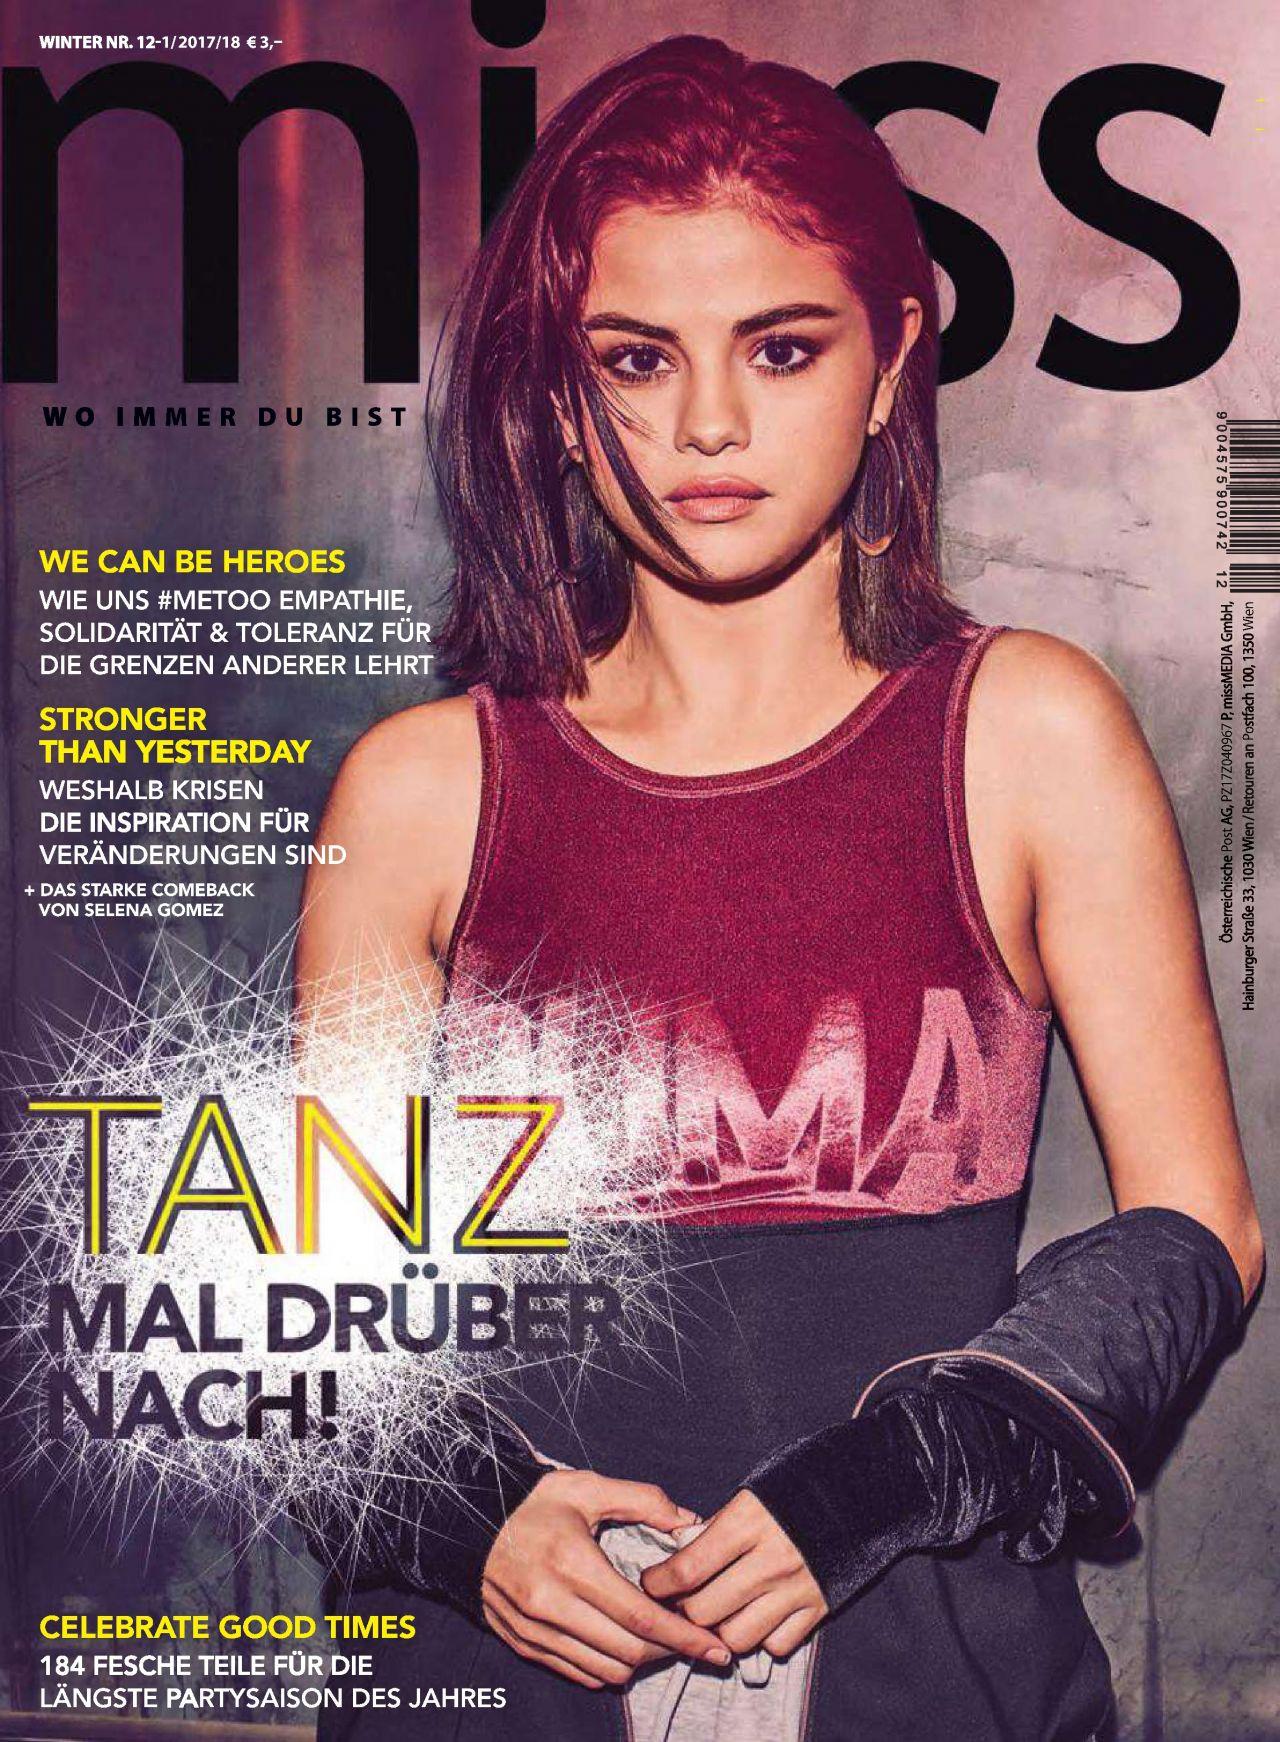 Selena Gomez - Miss Magazine Winter 2017-2018